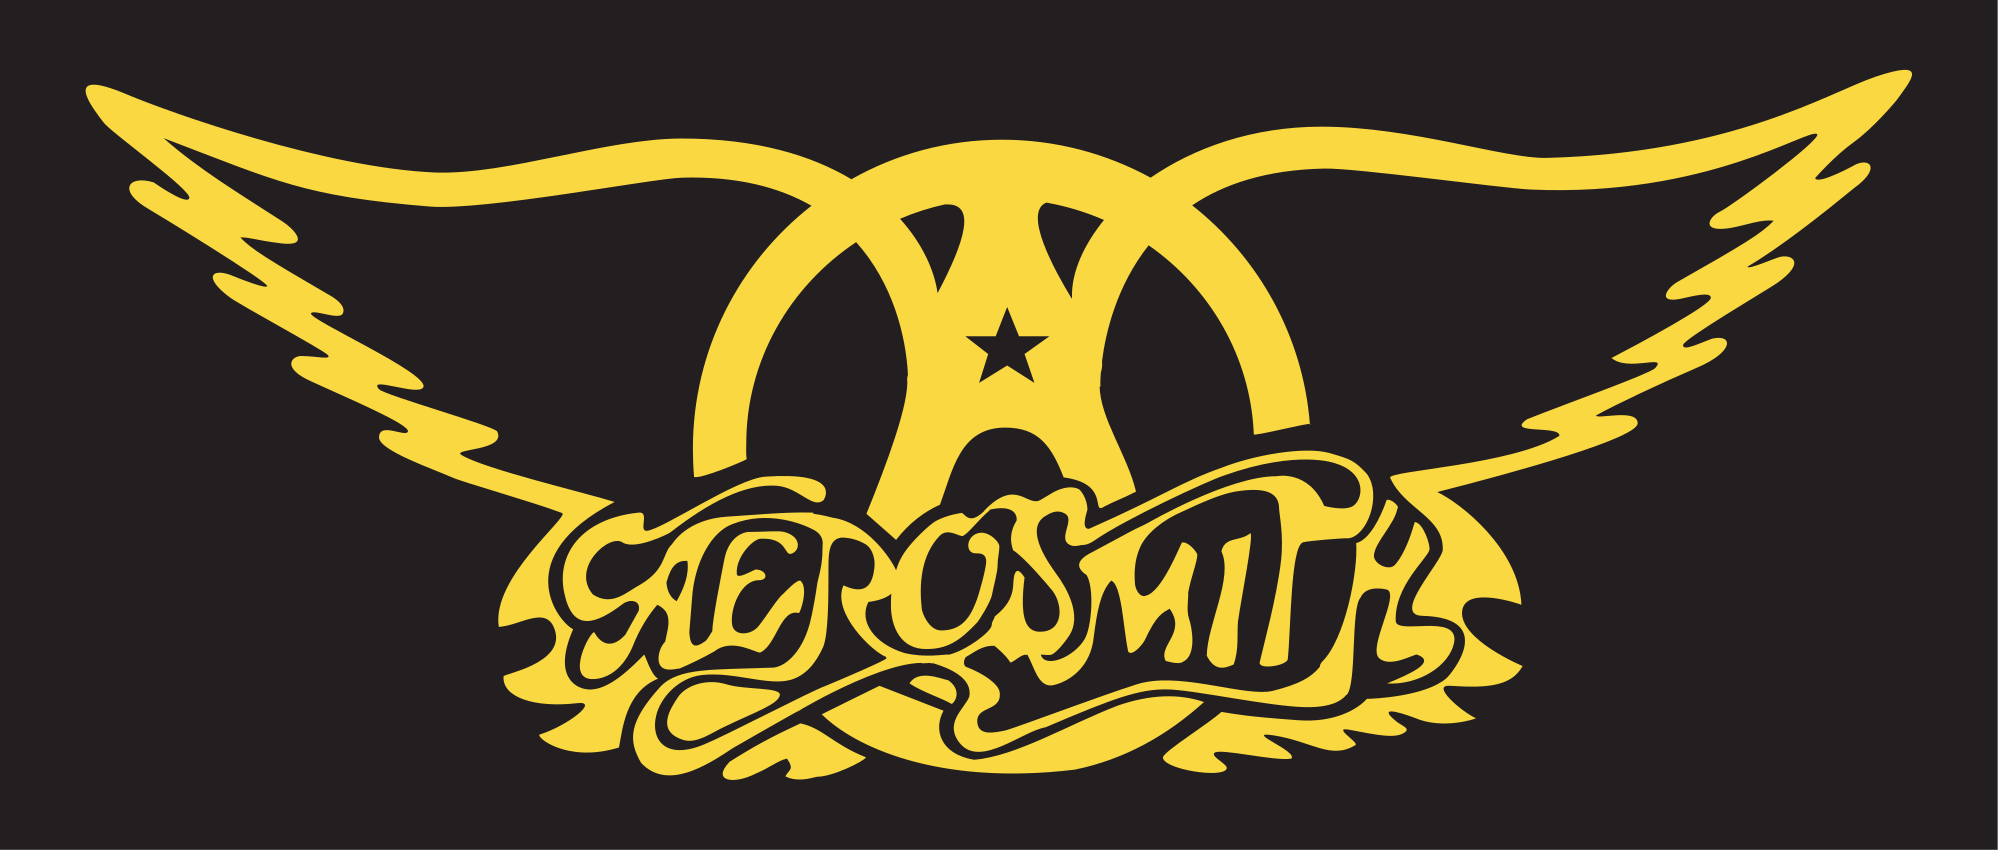 Aerosmith Logos